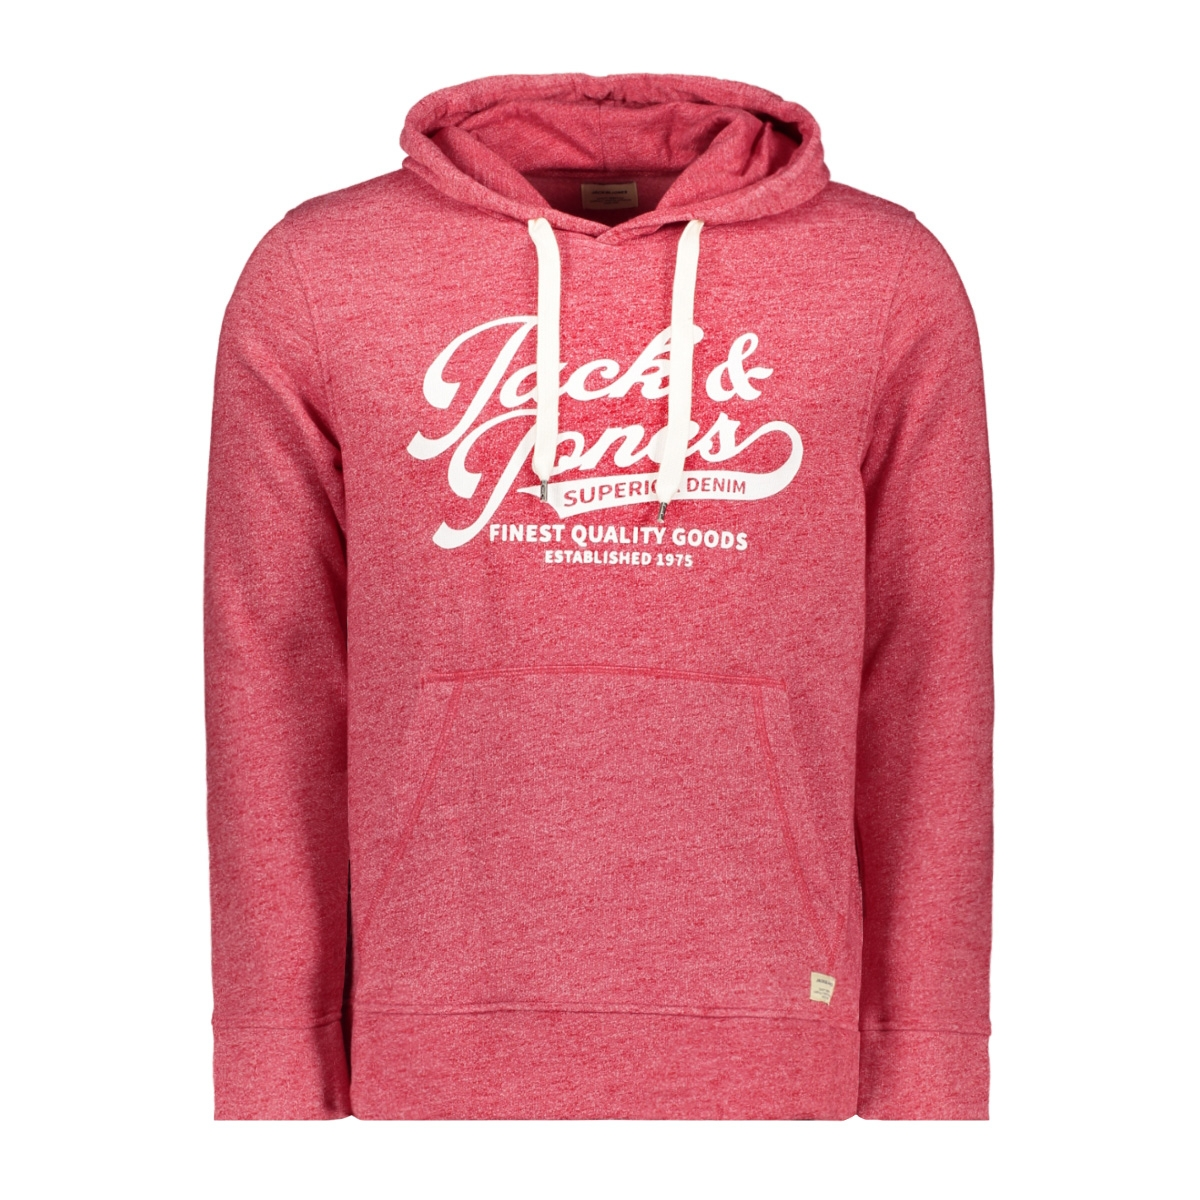 jjepanther sweat hood noos 12141011 jack & jones sweater tango red/reg fit